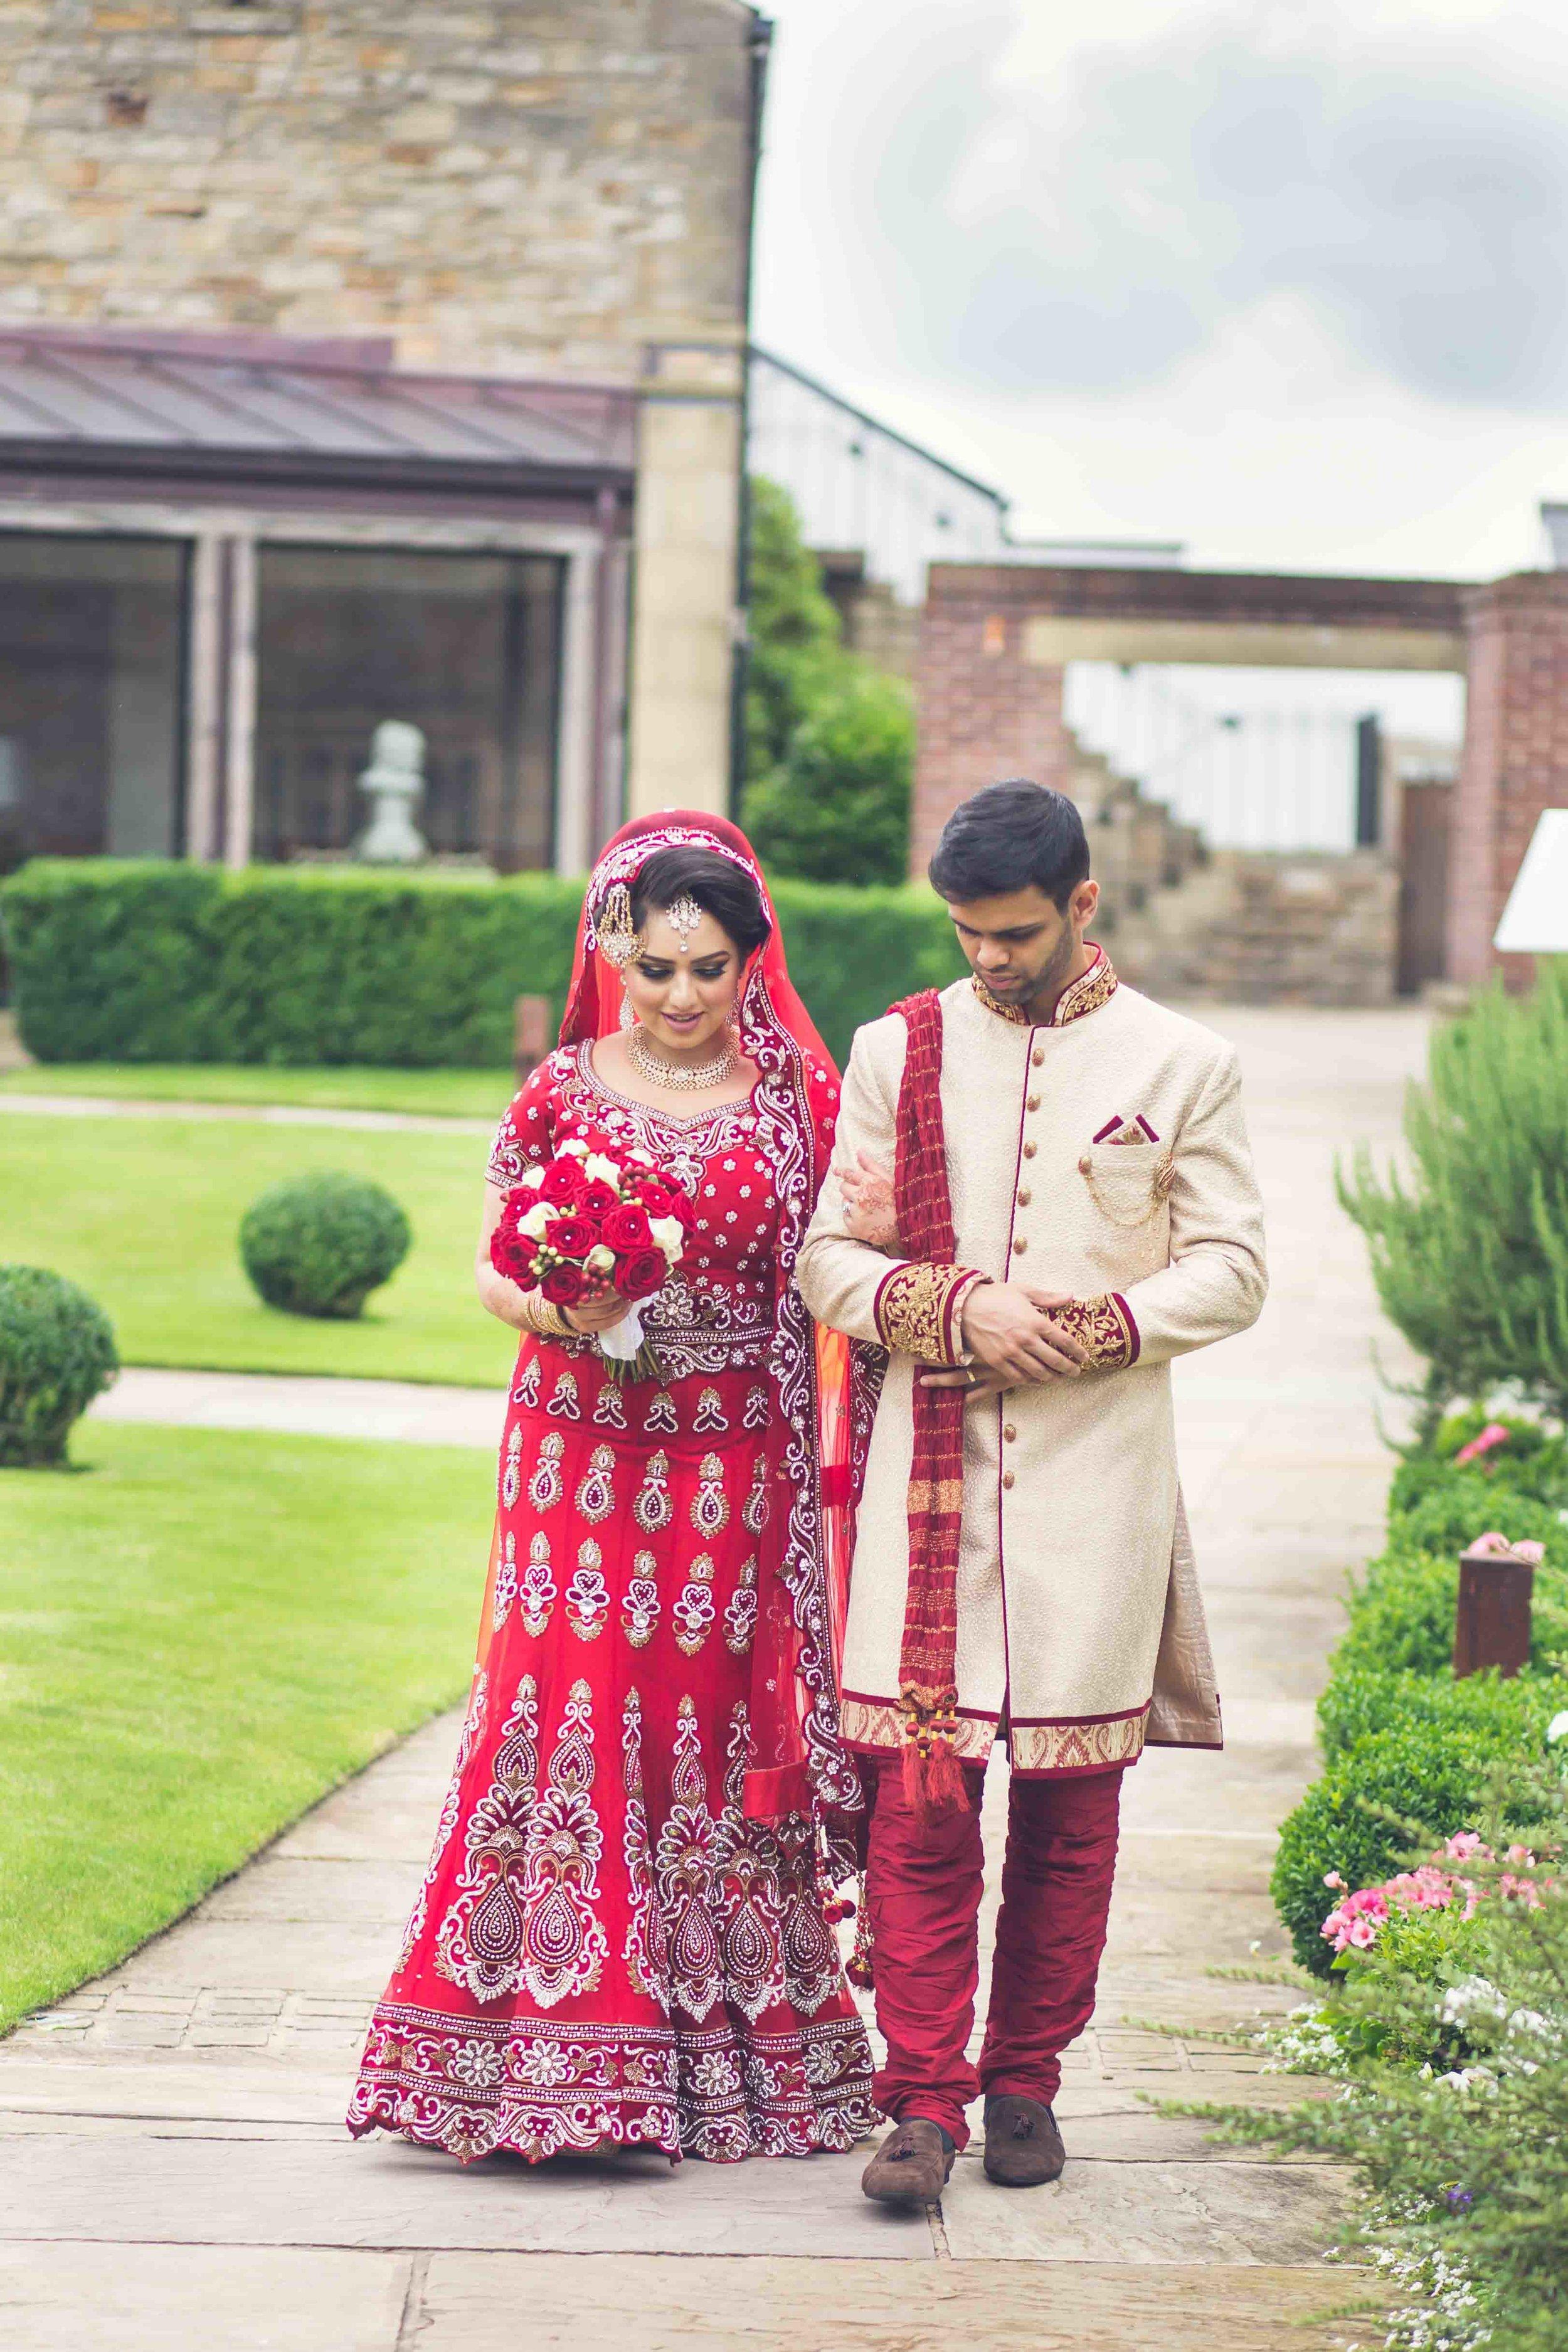 Asian Wedding Photographer Opu Sultan Photography Lyme Park Scotland Edinburgh Glasgow London Manchester Liverpool Birmingham Wedding Photos prewed shoot Jams & Tams Blod-8.jpg